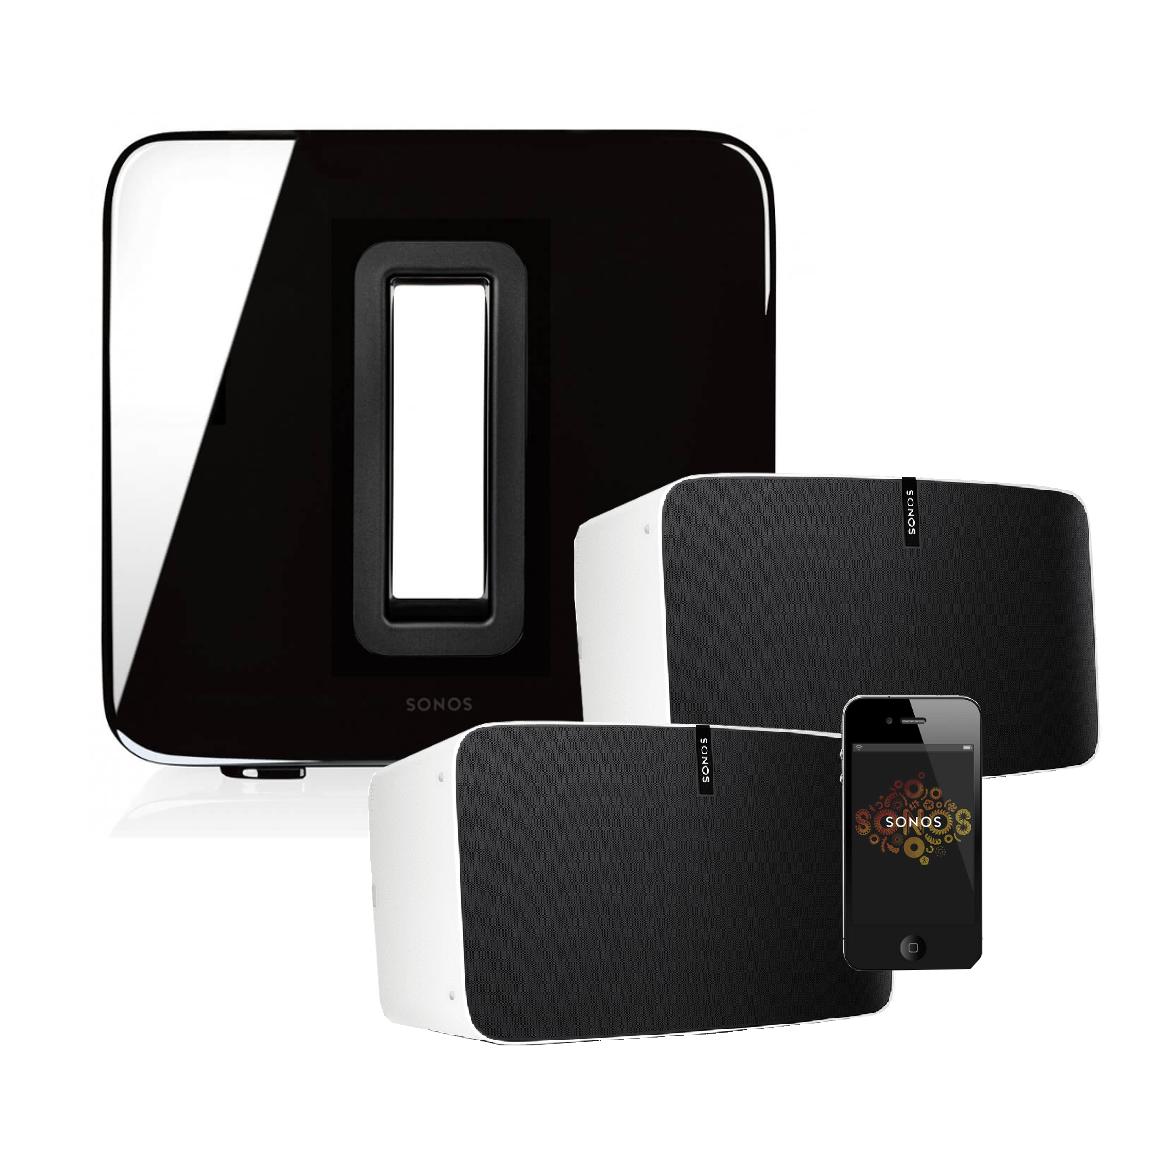 Sonos Surround Set 5